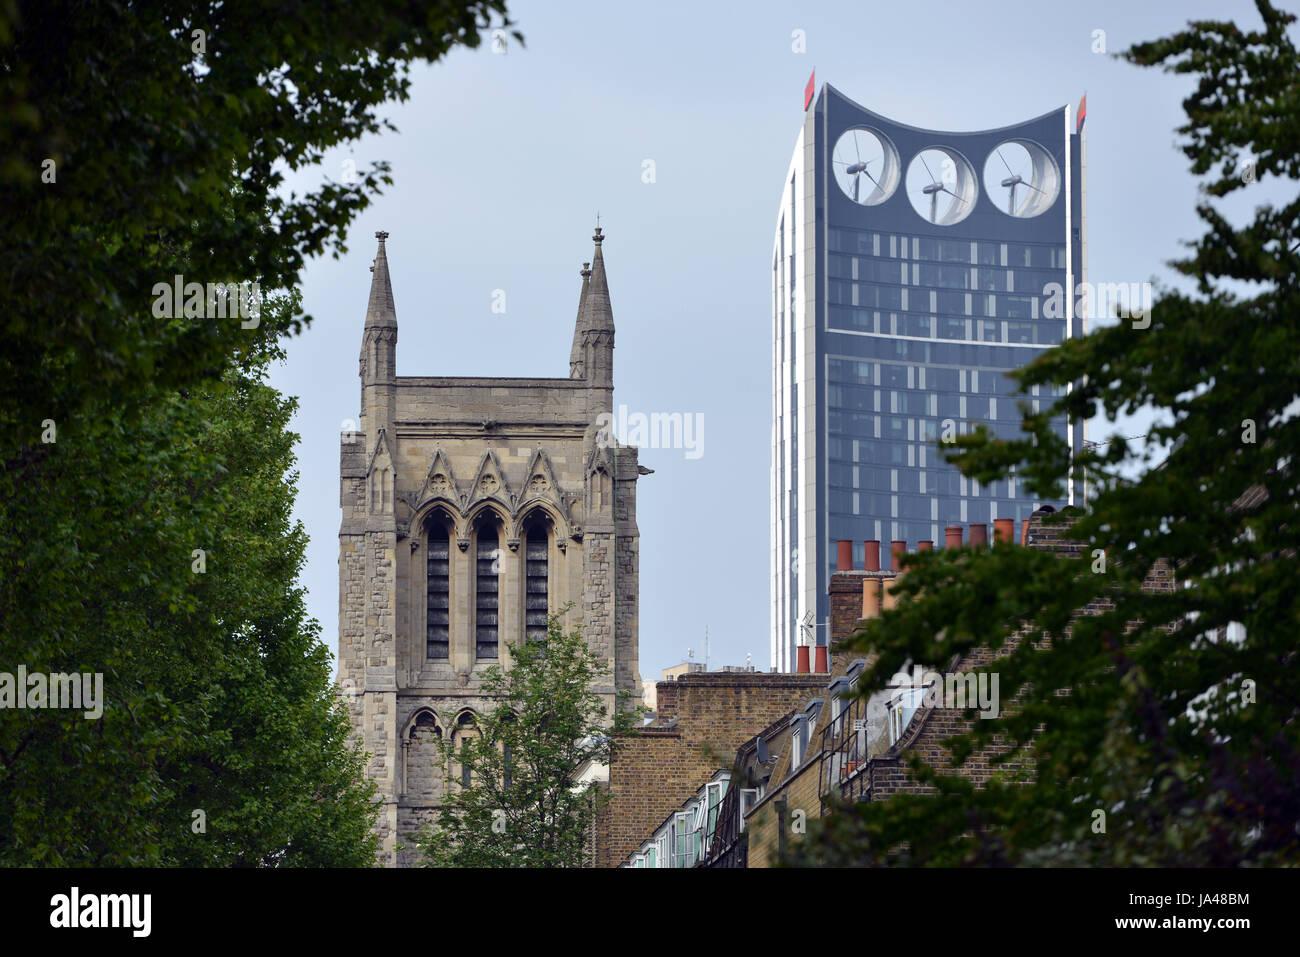 The church St Mary, Newington and Strata SE1 (the Razor), London - Stock Image